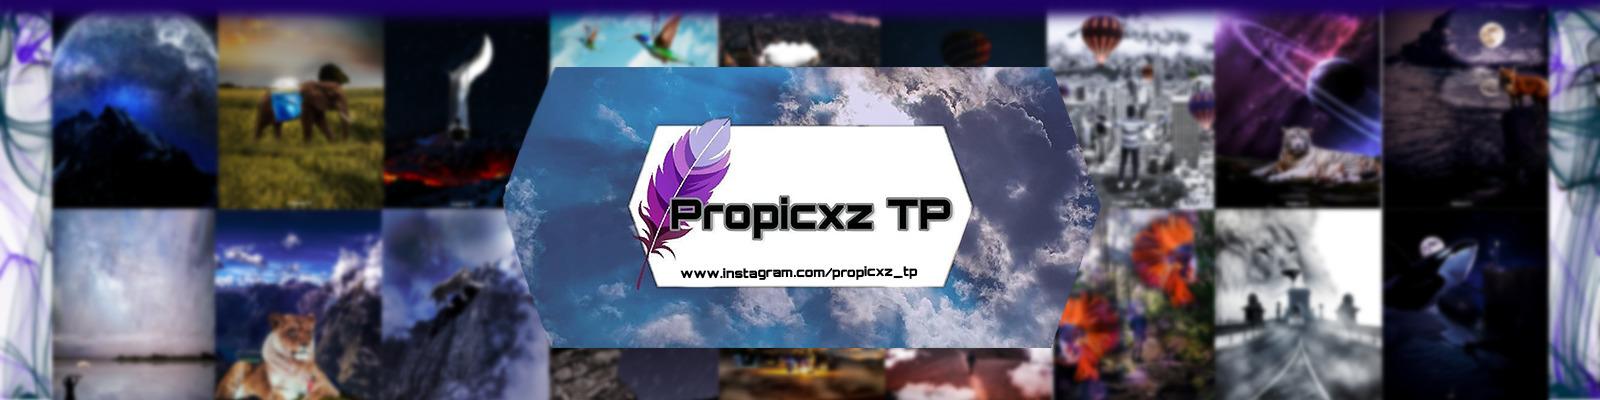 PropicxzTP (@propicxztp) Cover Image